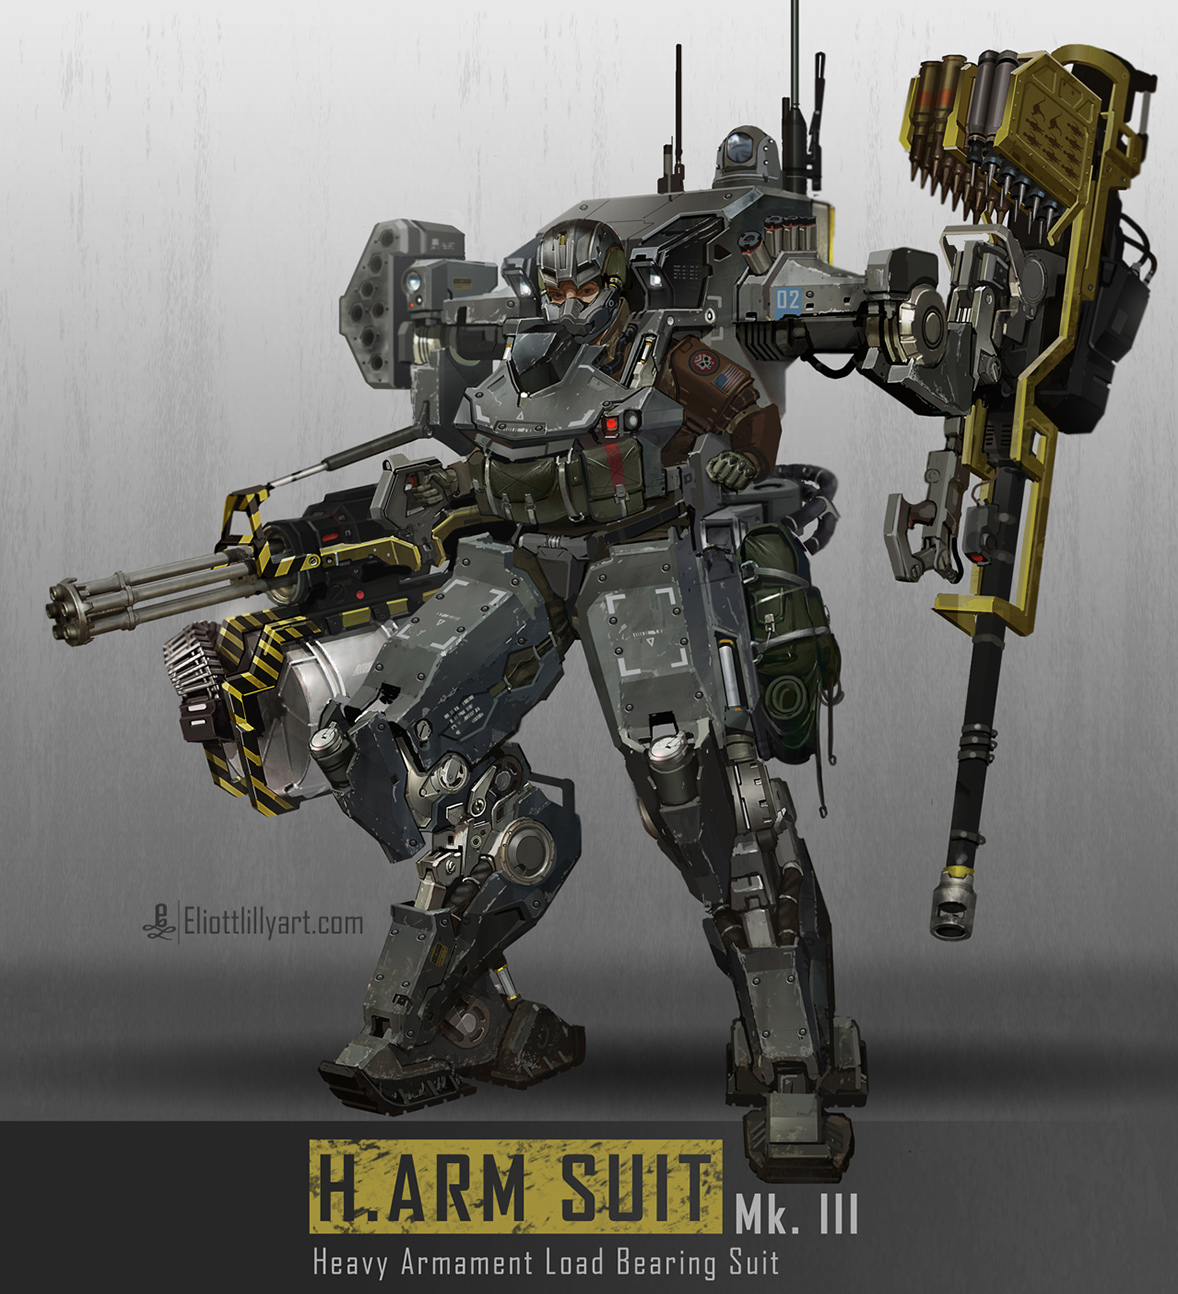 meet the soldier robotic arm